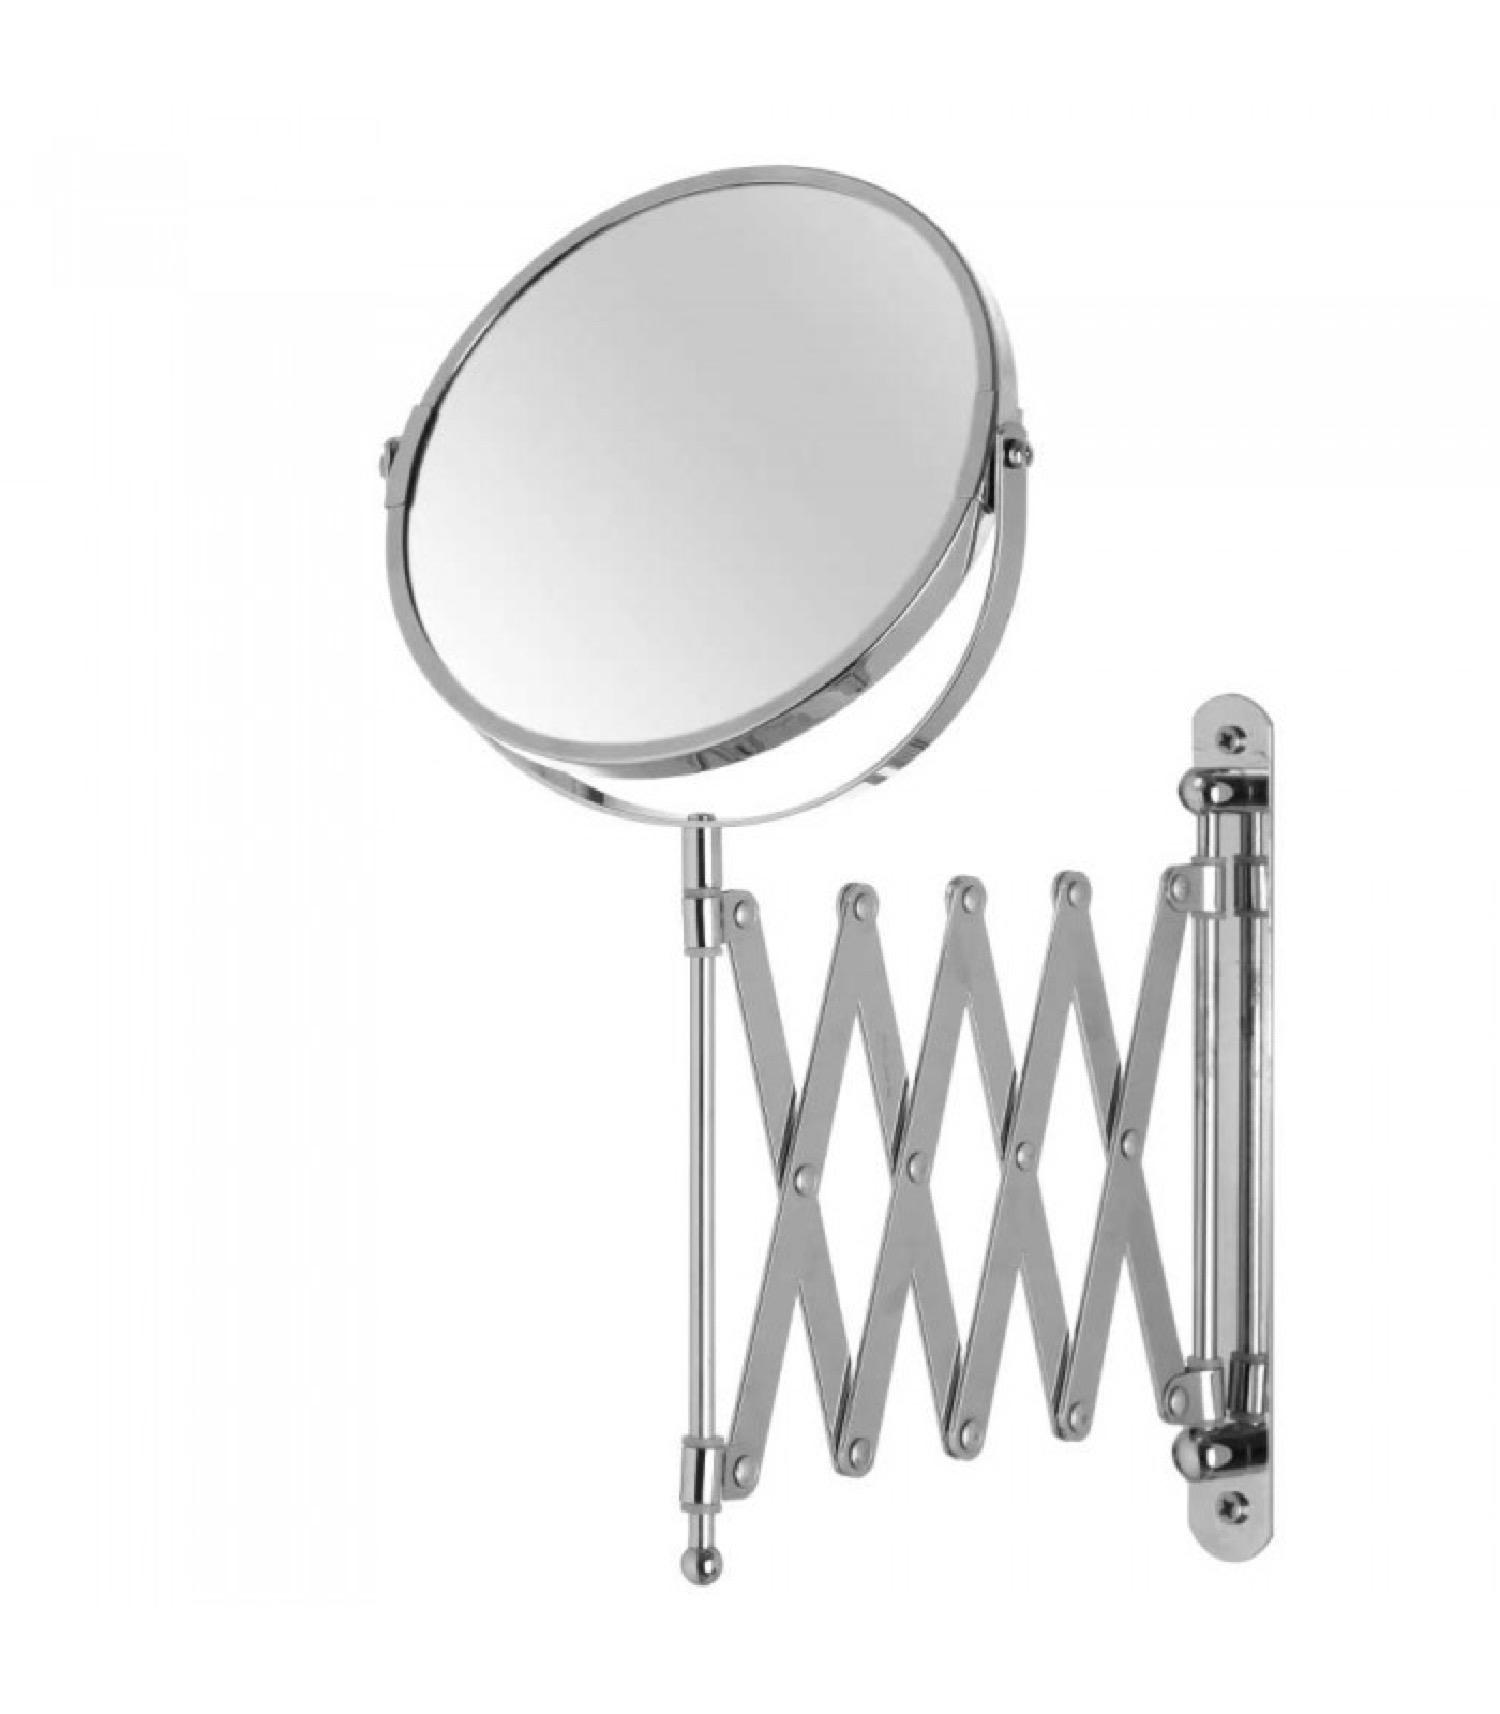 Miroir mural grossissant x2 double face avec bras